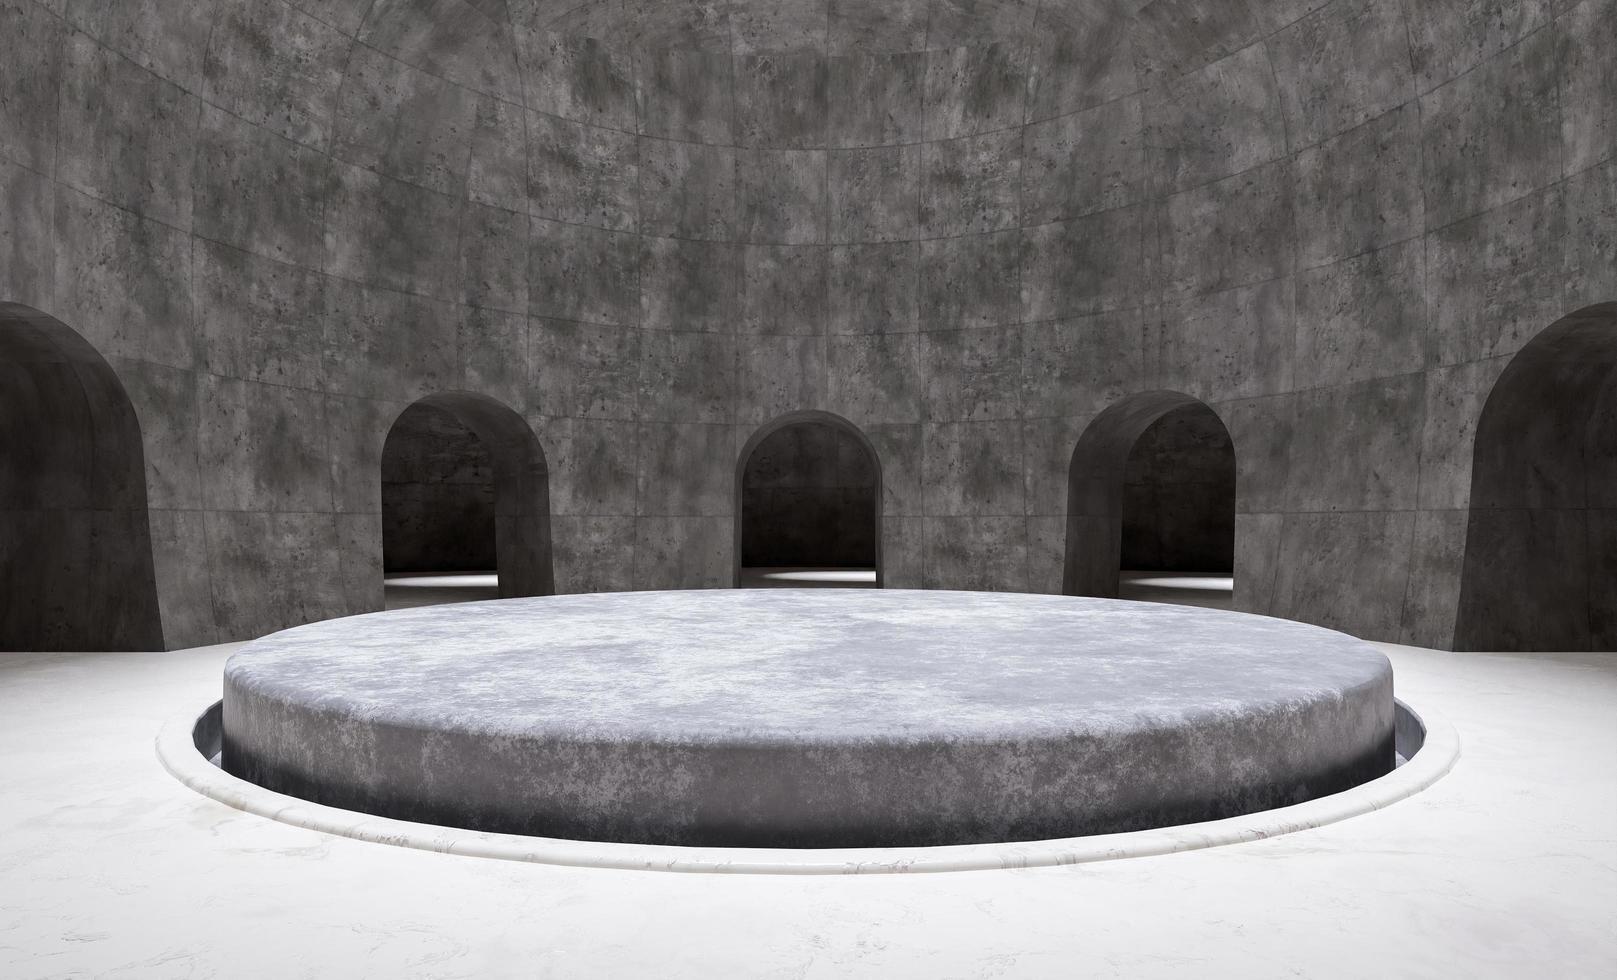 minimalt cirkulärt produktpodium i ett tomt rum foto